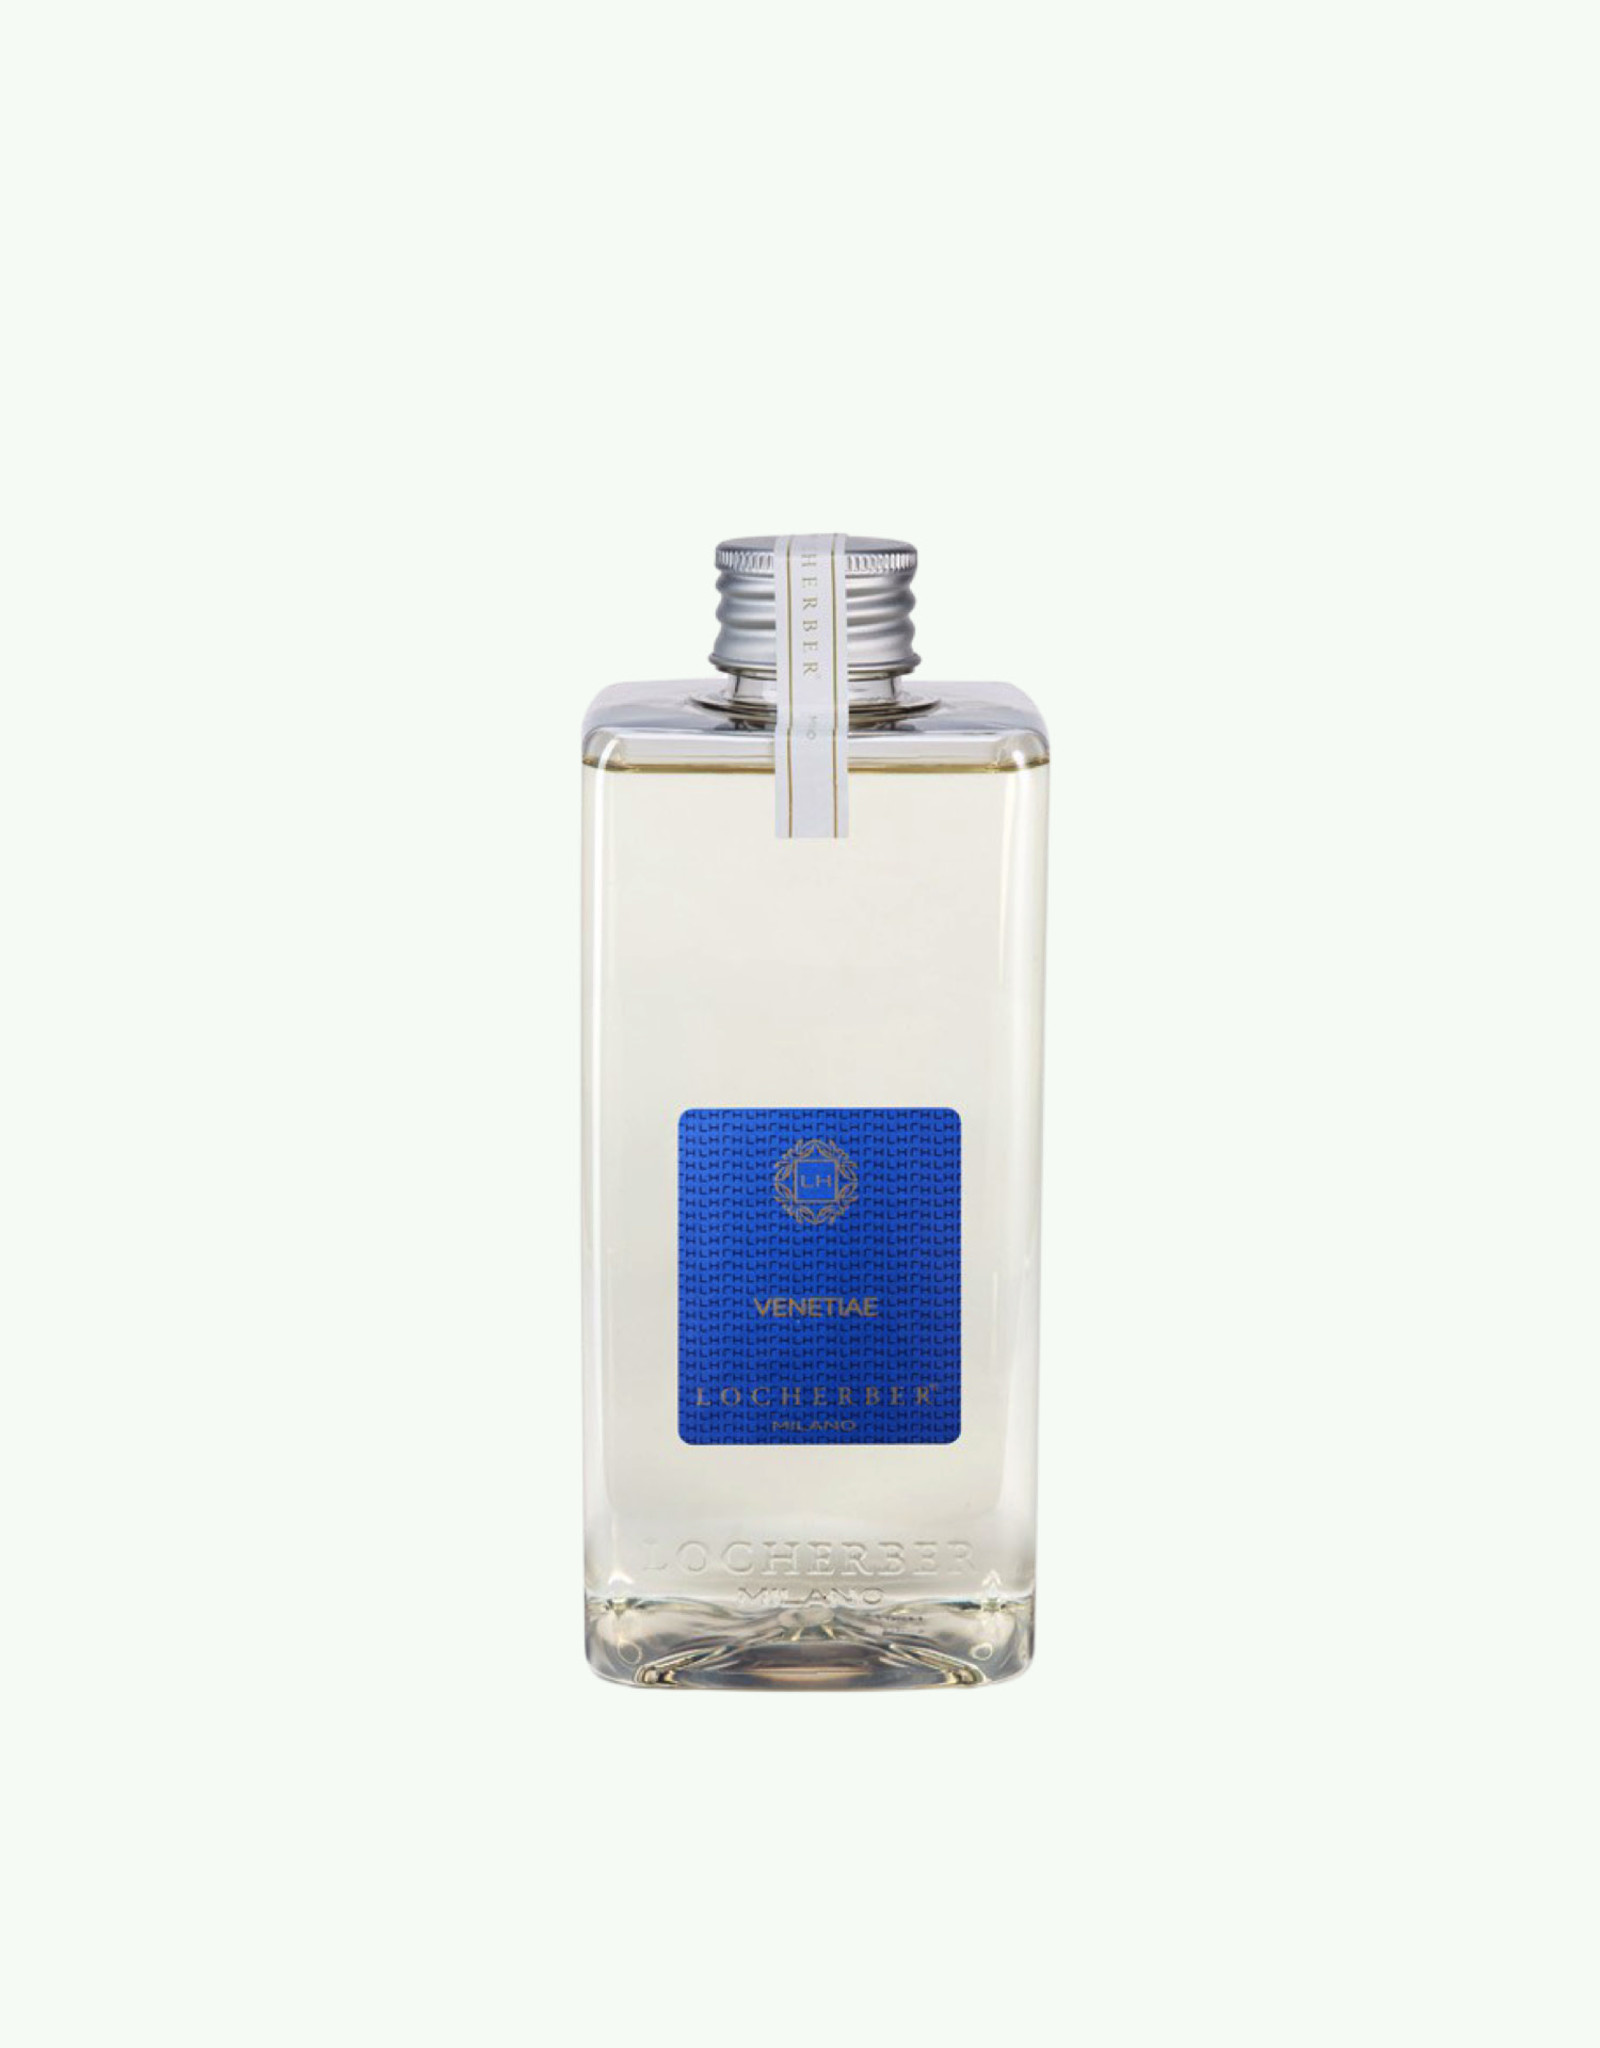 Locherber Locherber - Venetiae - Bouteille de recharge 500 ml